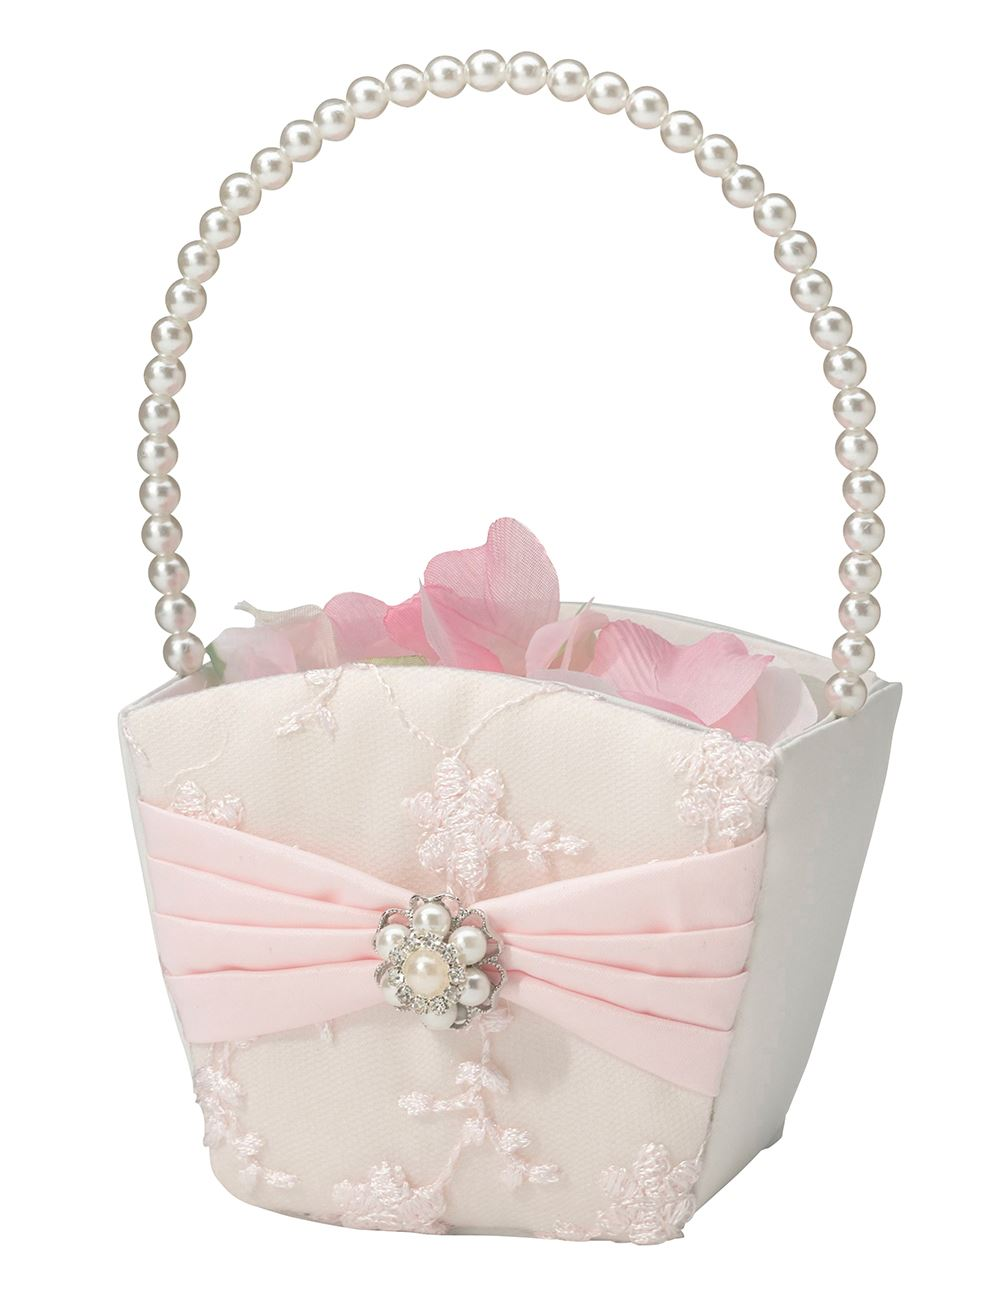 Bride Bridesmaid Wedding Bouquet Flower Girl Baskets Ebay